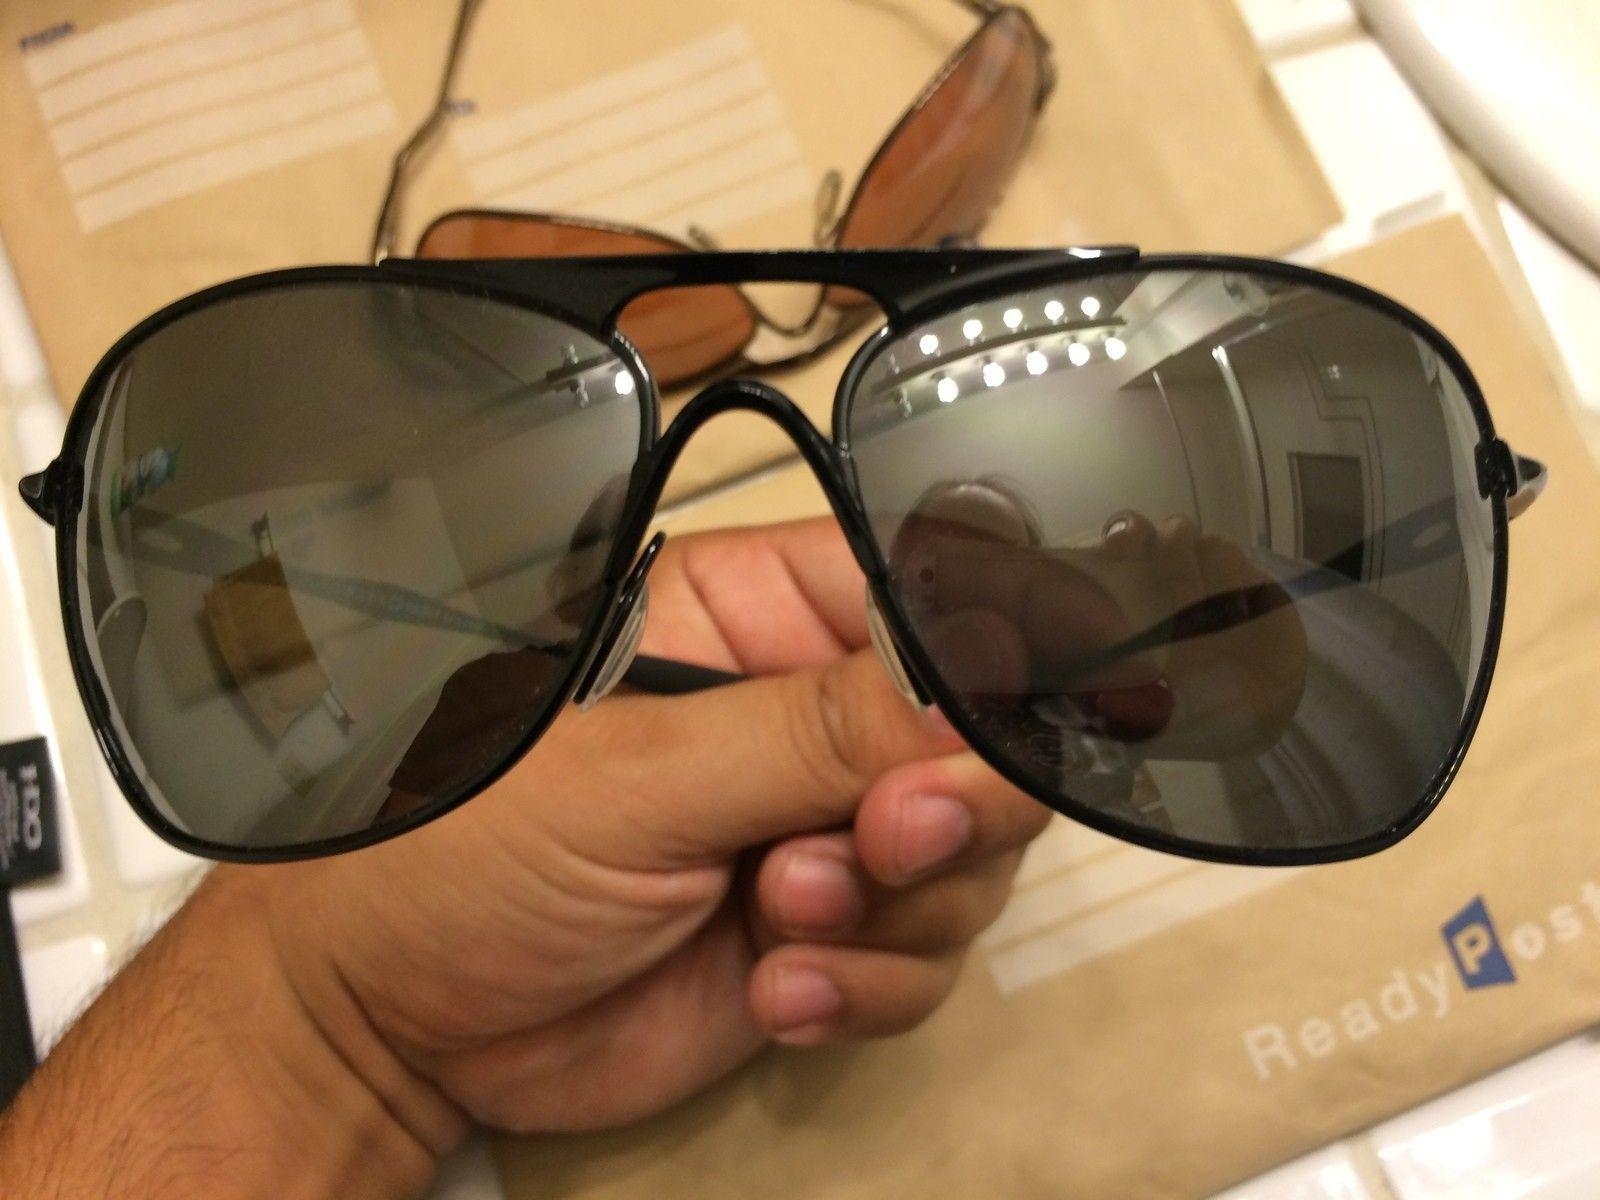 Crosshair 2012 -Black Polarized - PRICE DROP- $79 - 2015-07-01 21.14.44.jpg